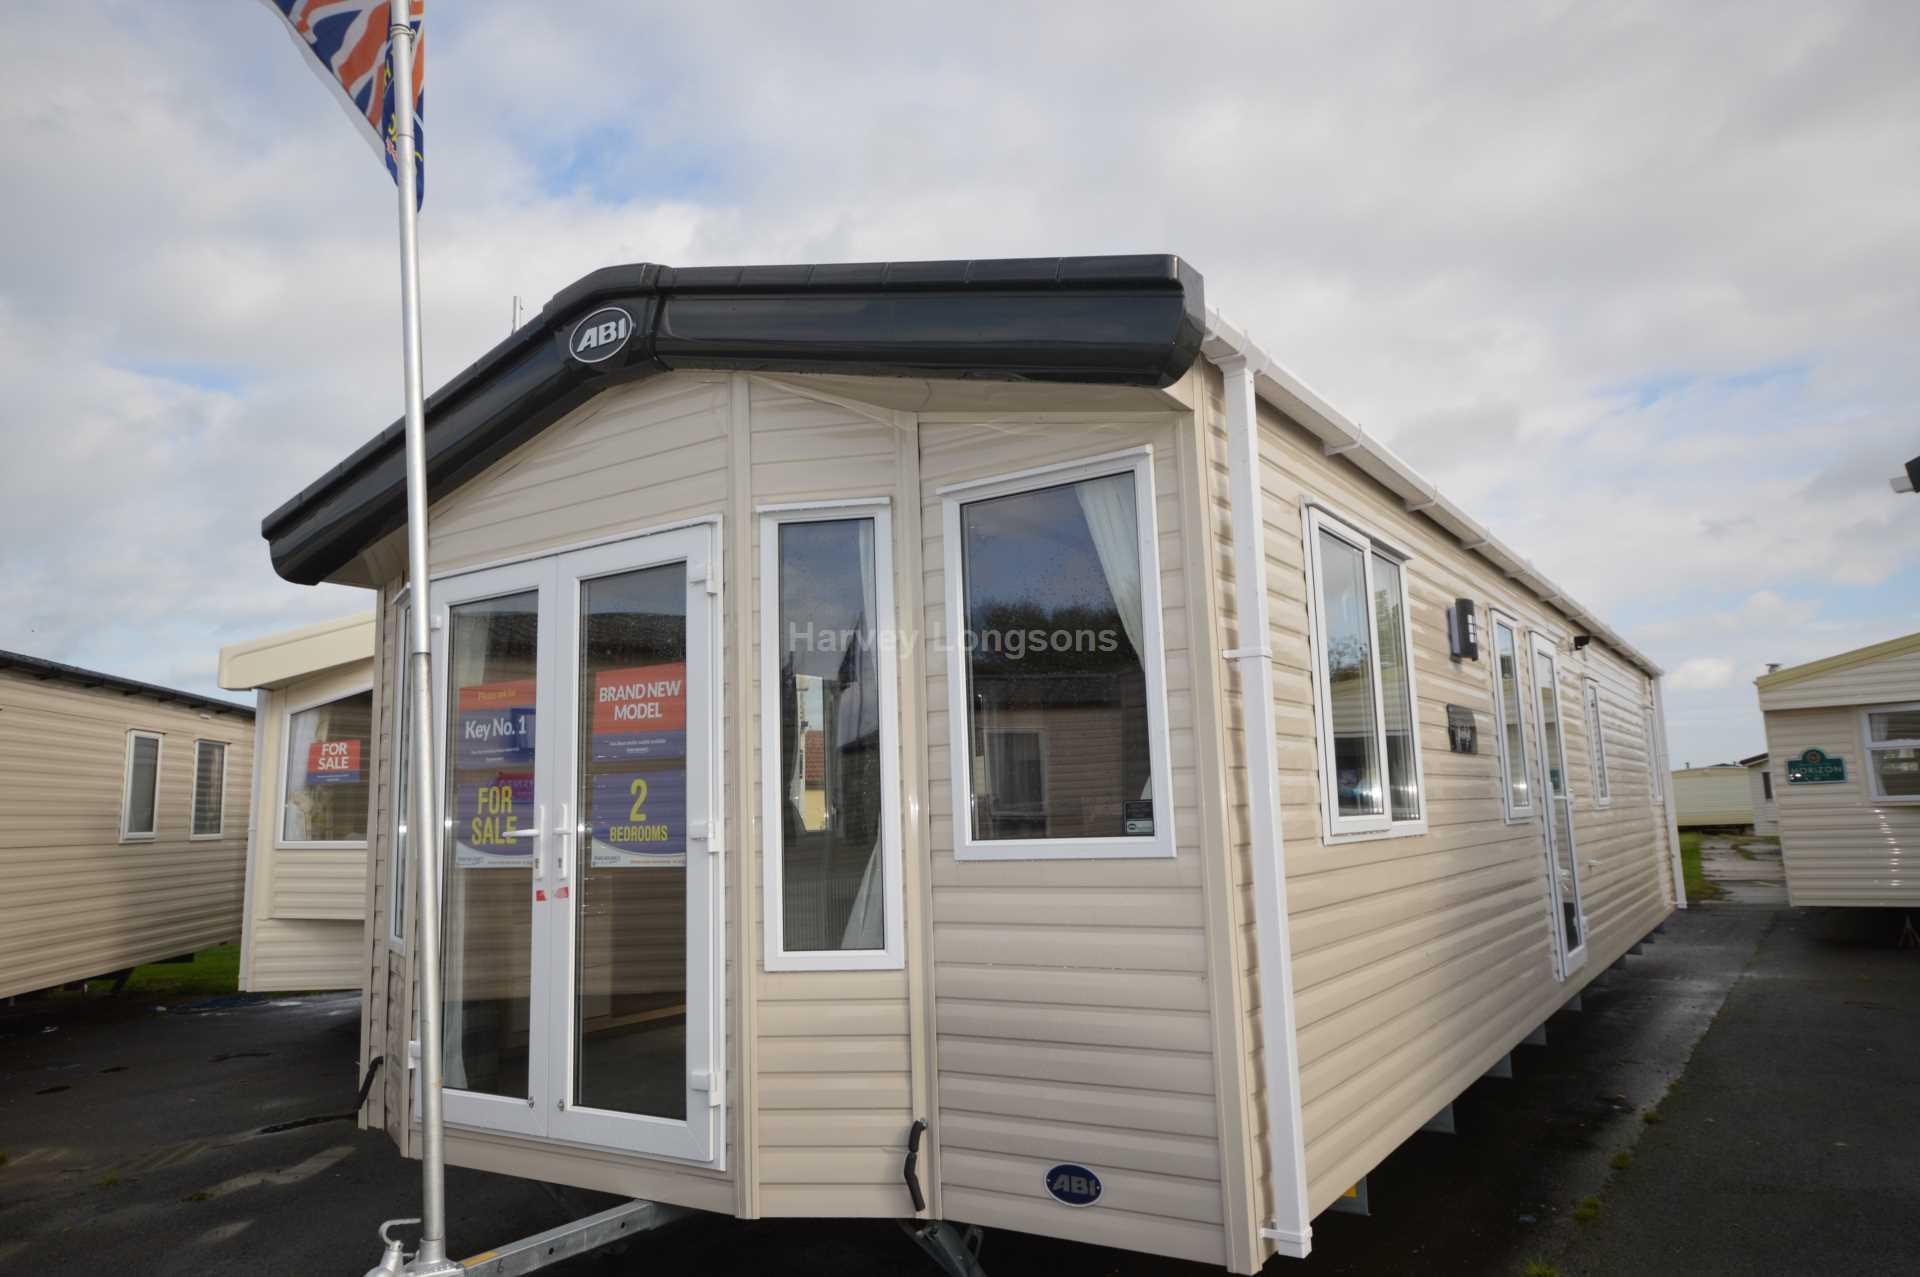 Lastest Bedroom Caravan For Sale Seaview Holiday Park St Johns Road